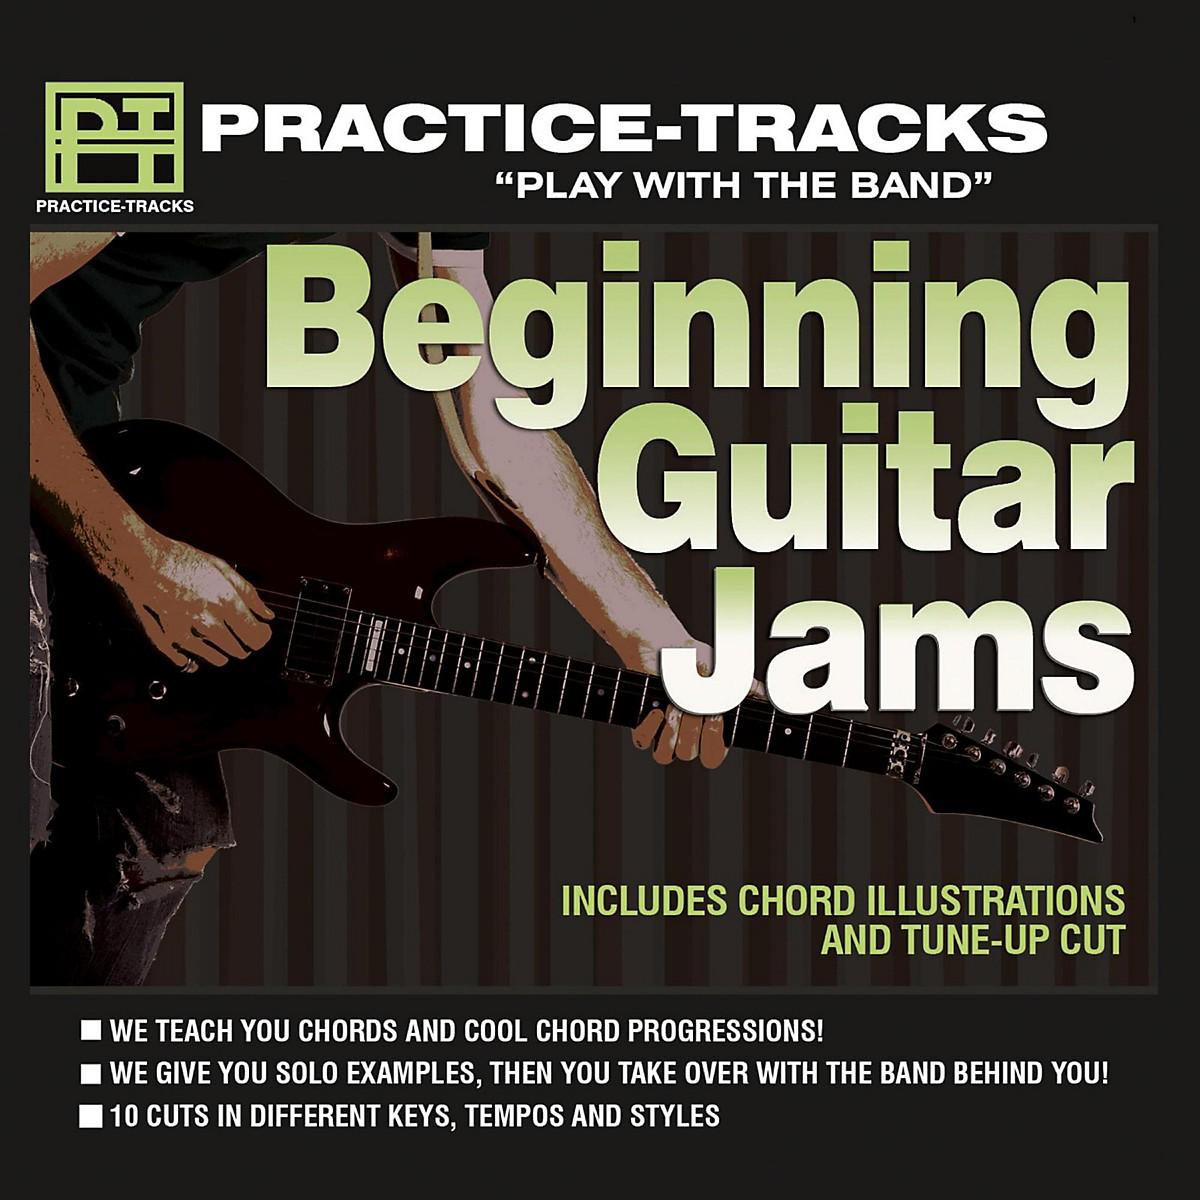 Practice Tracks Practice-Tracks: Beginning Guitar Jams CD